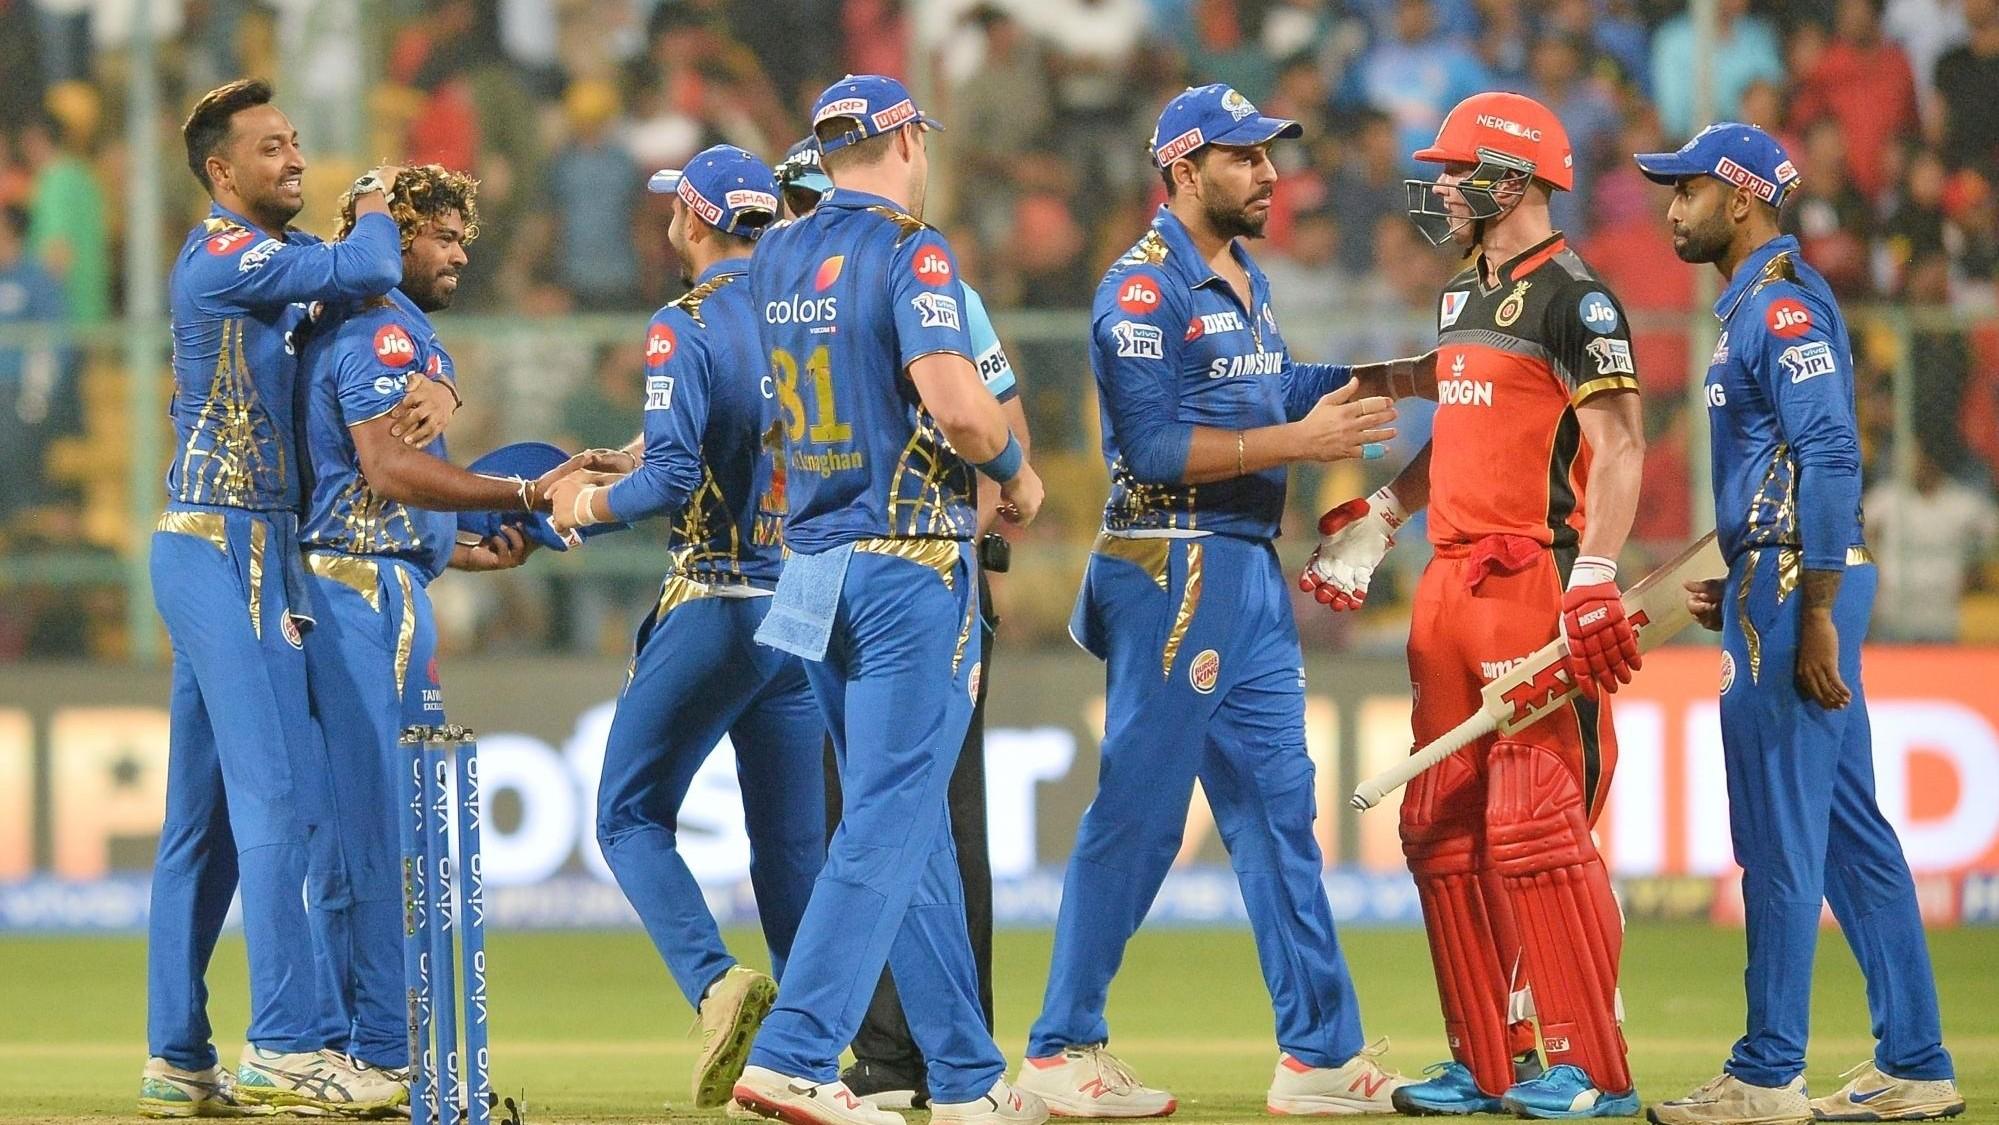 IPL 2019: Match 7, RCB v MI - Statistical Highlights